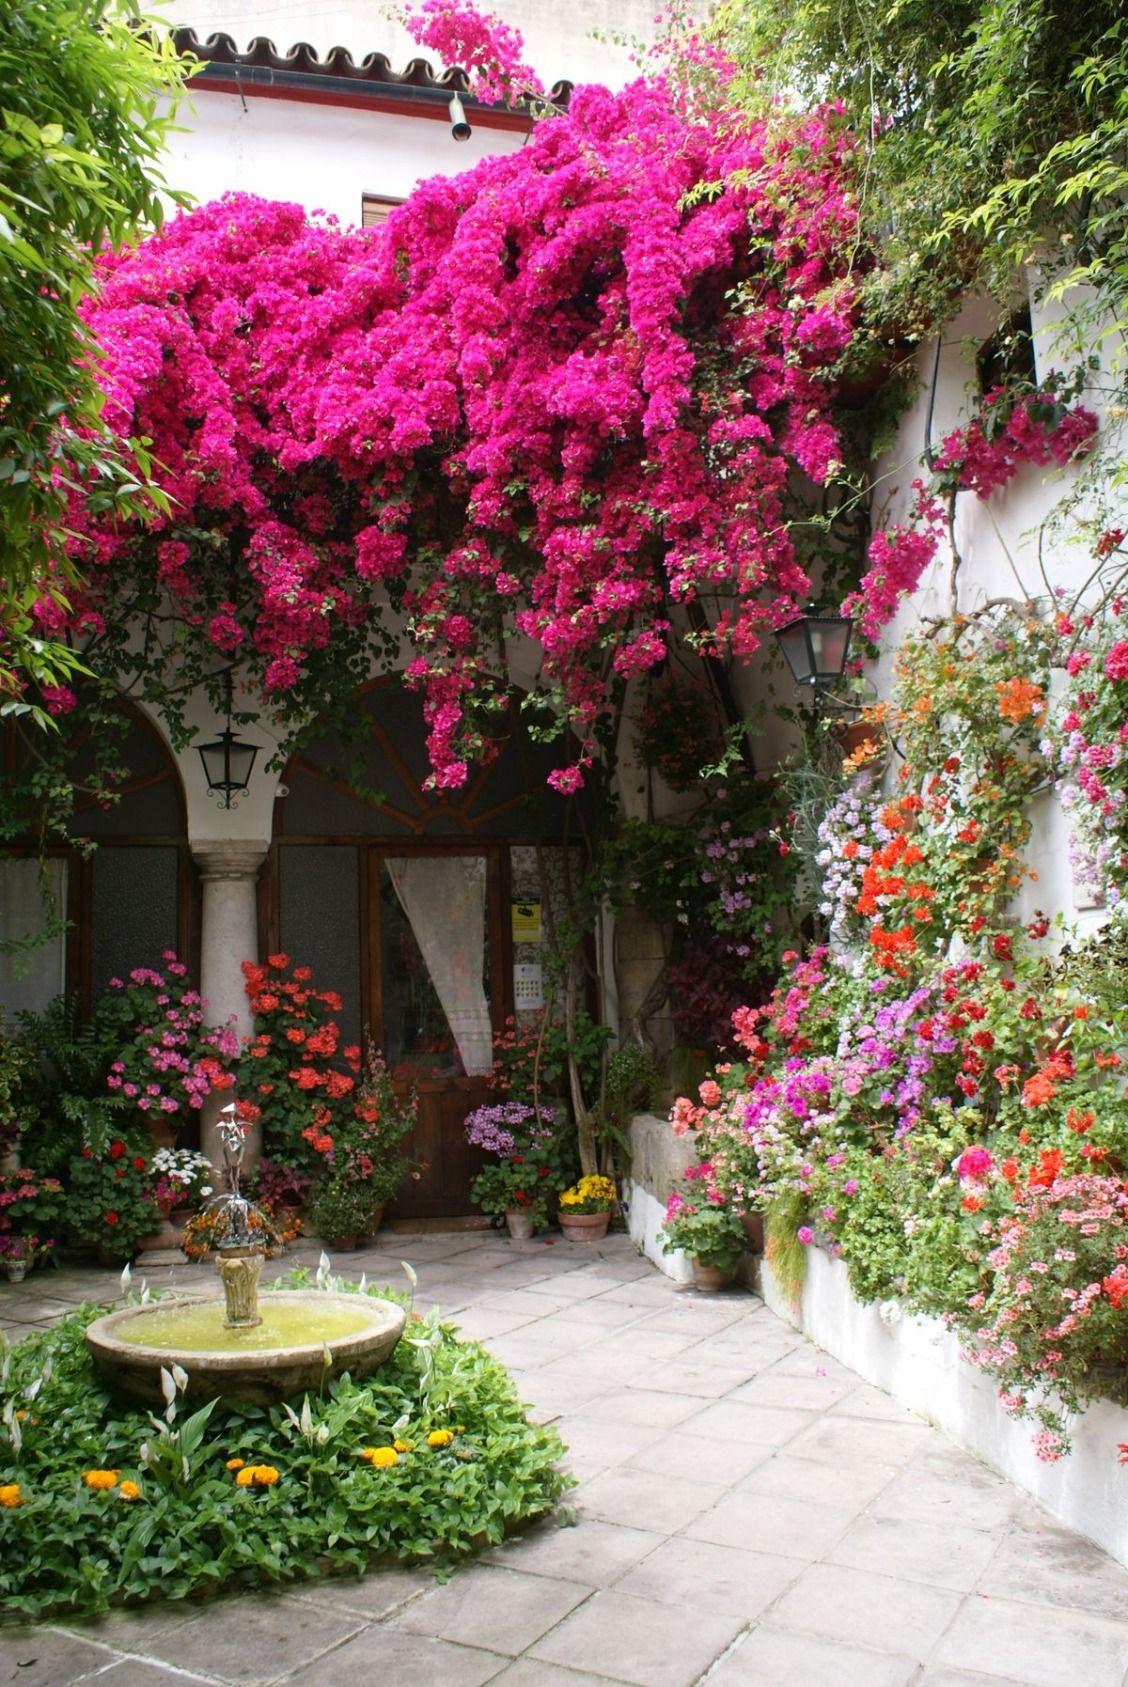 Gorgeous mediterranean inspired coutrtyard cloaked in hot pink gorgeous mediterranean inspired coutrtyard cloaked in hot pink blooming bougainvillea mightylinksfo